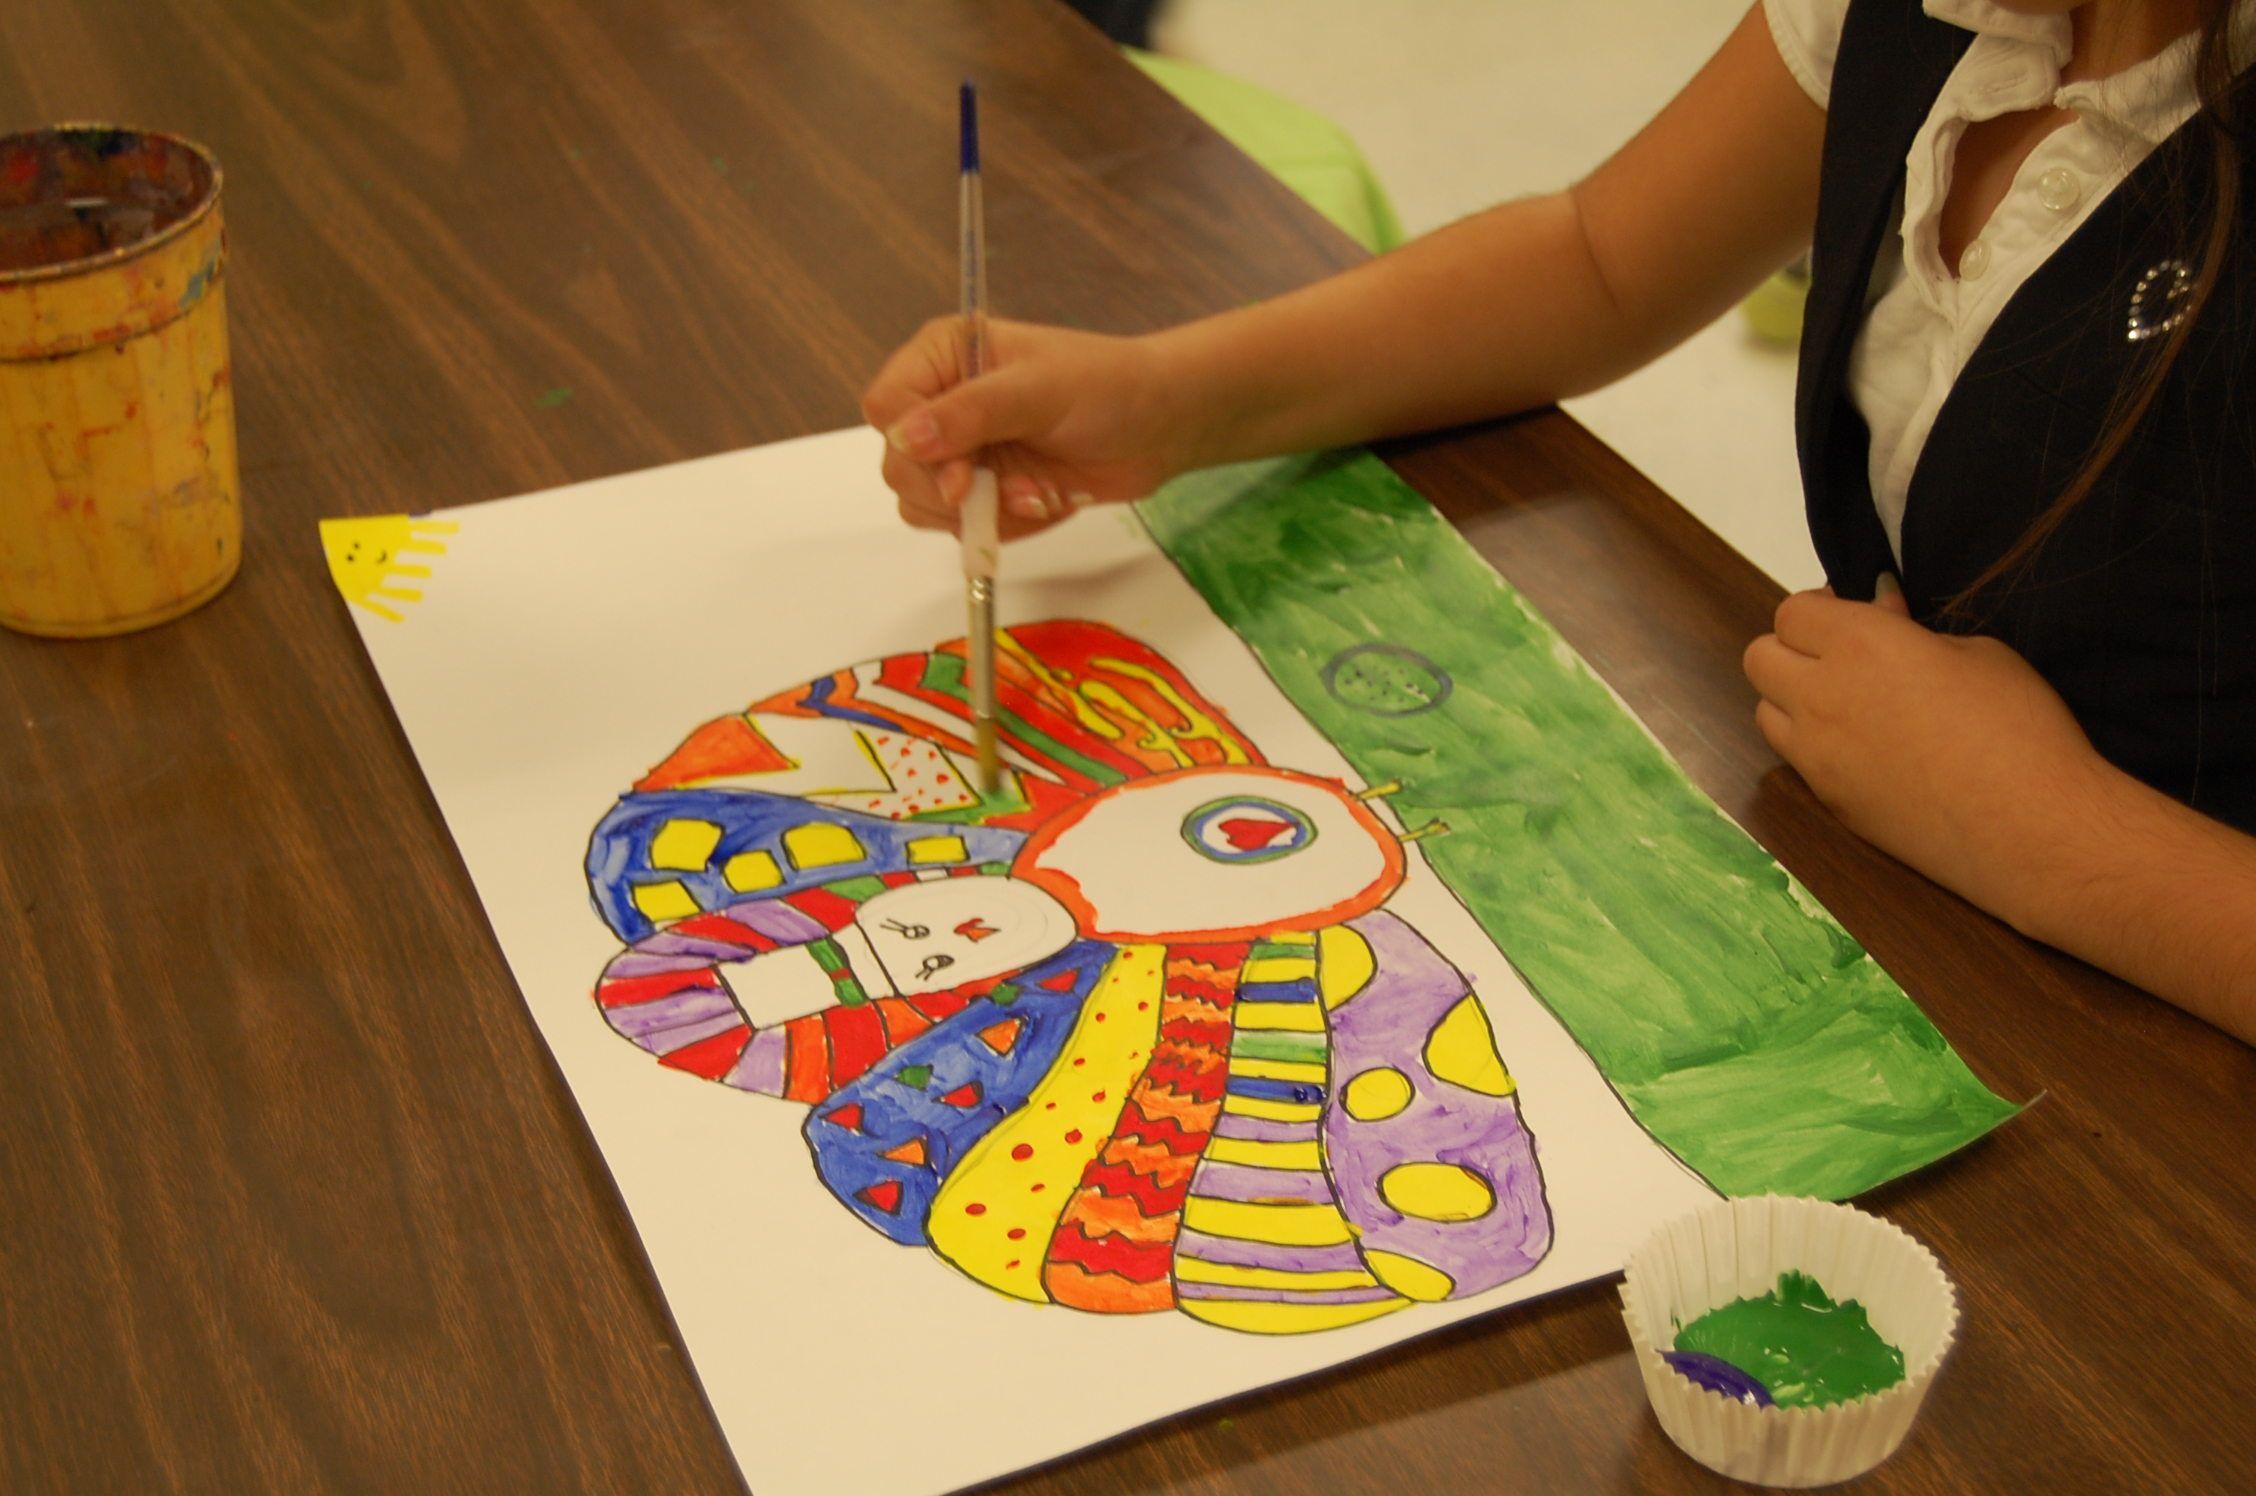 Thanksgiving Coloring Page 8 (Coloring Page) Coloring ...  |Good Thanksgiving Drawings